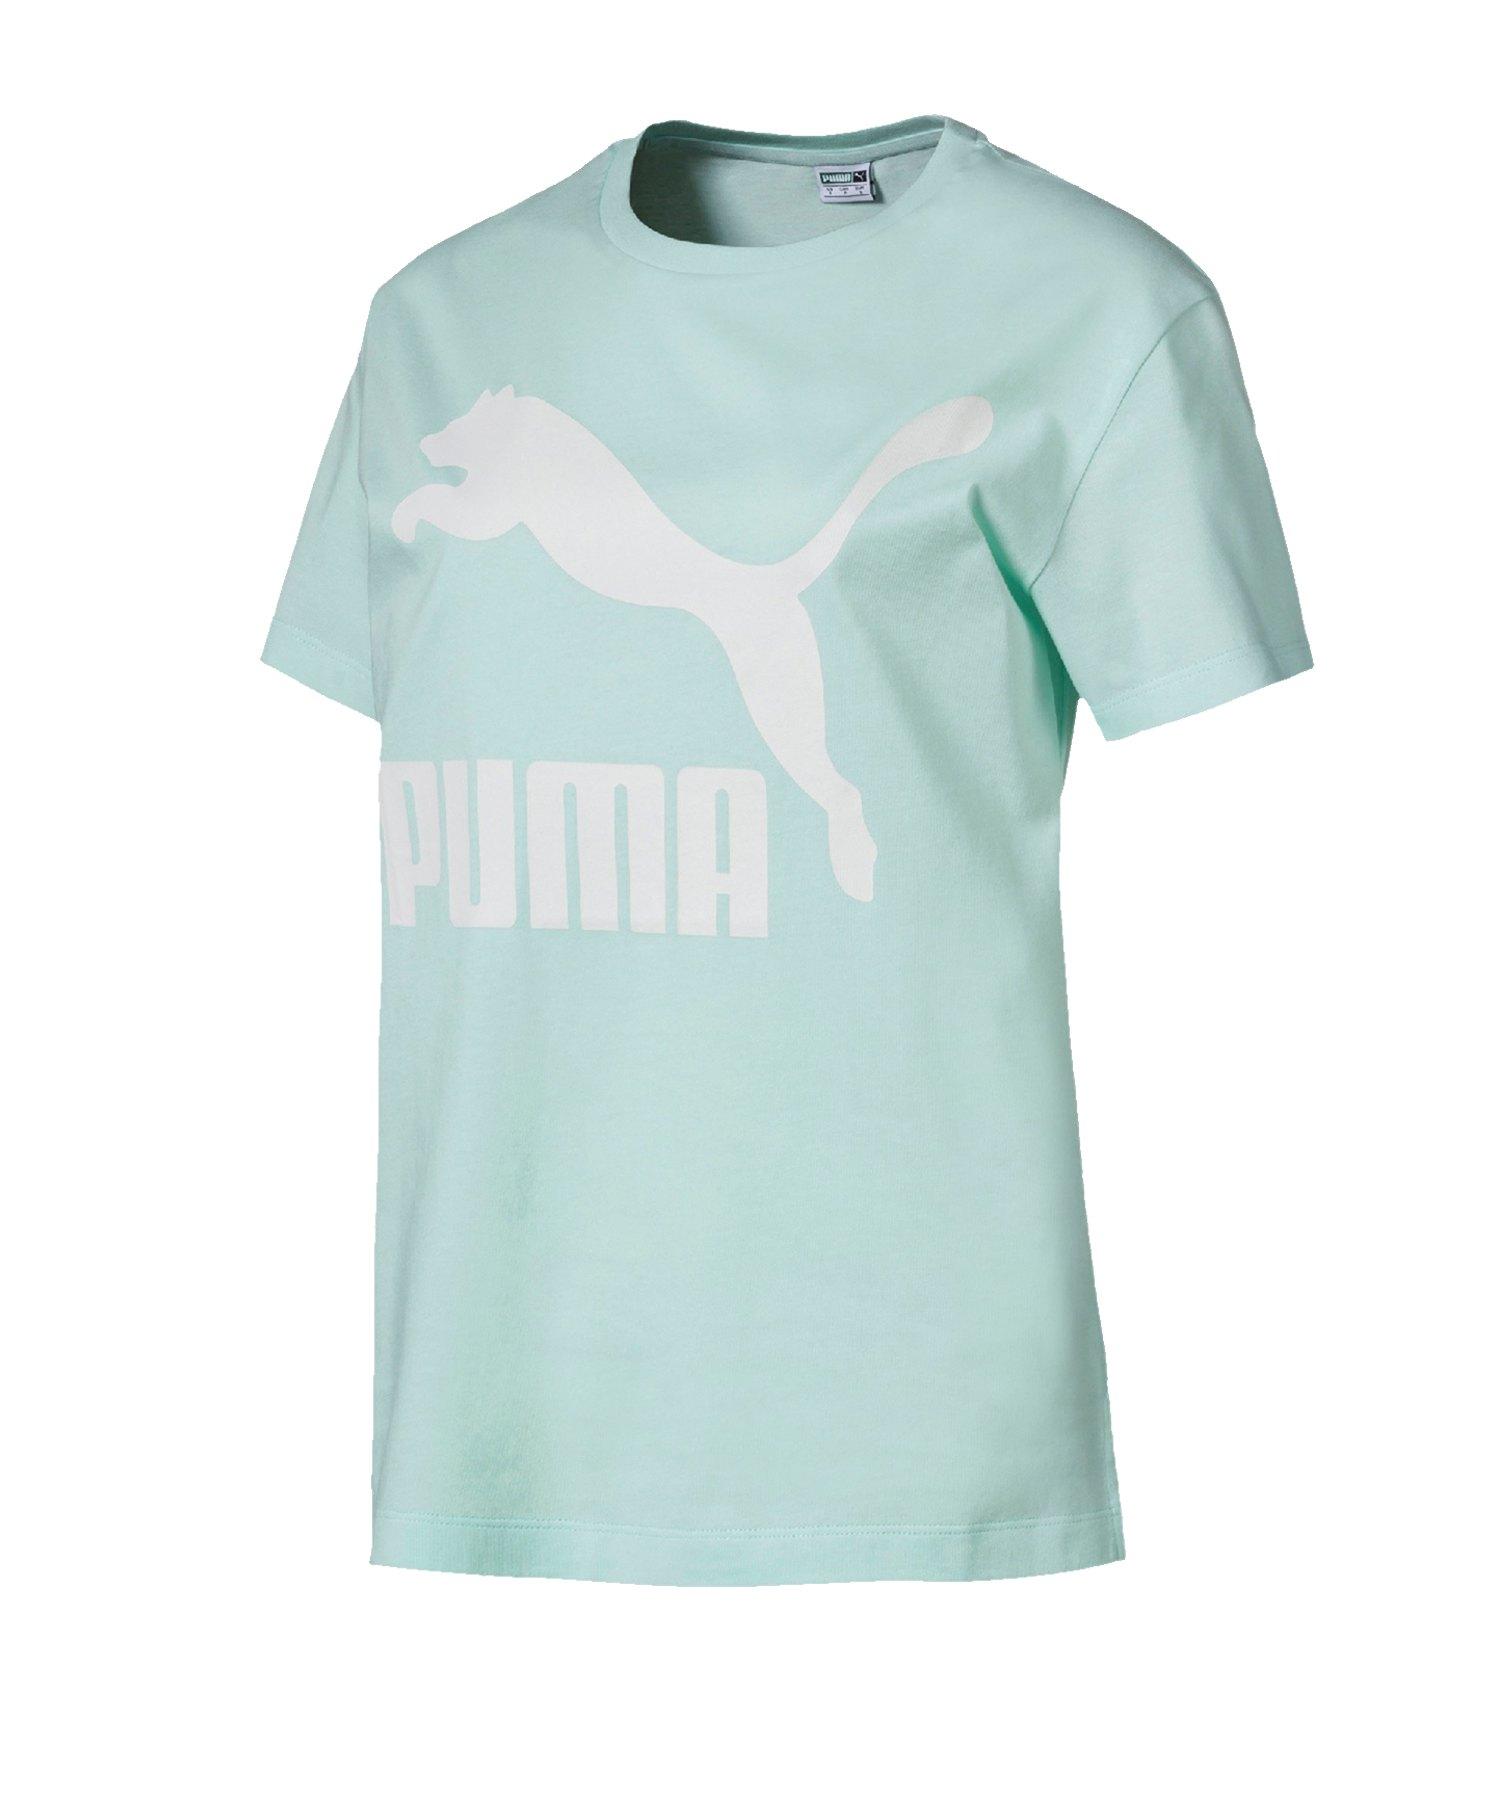 PUMA Classics Logo Tee T-Shirt Damen Blau F34